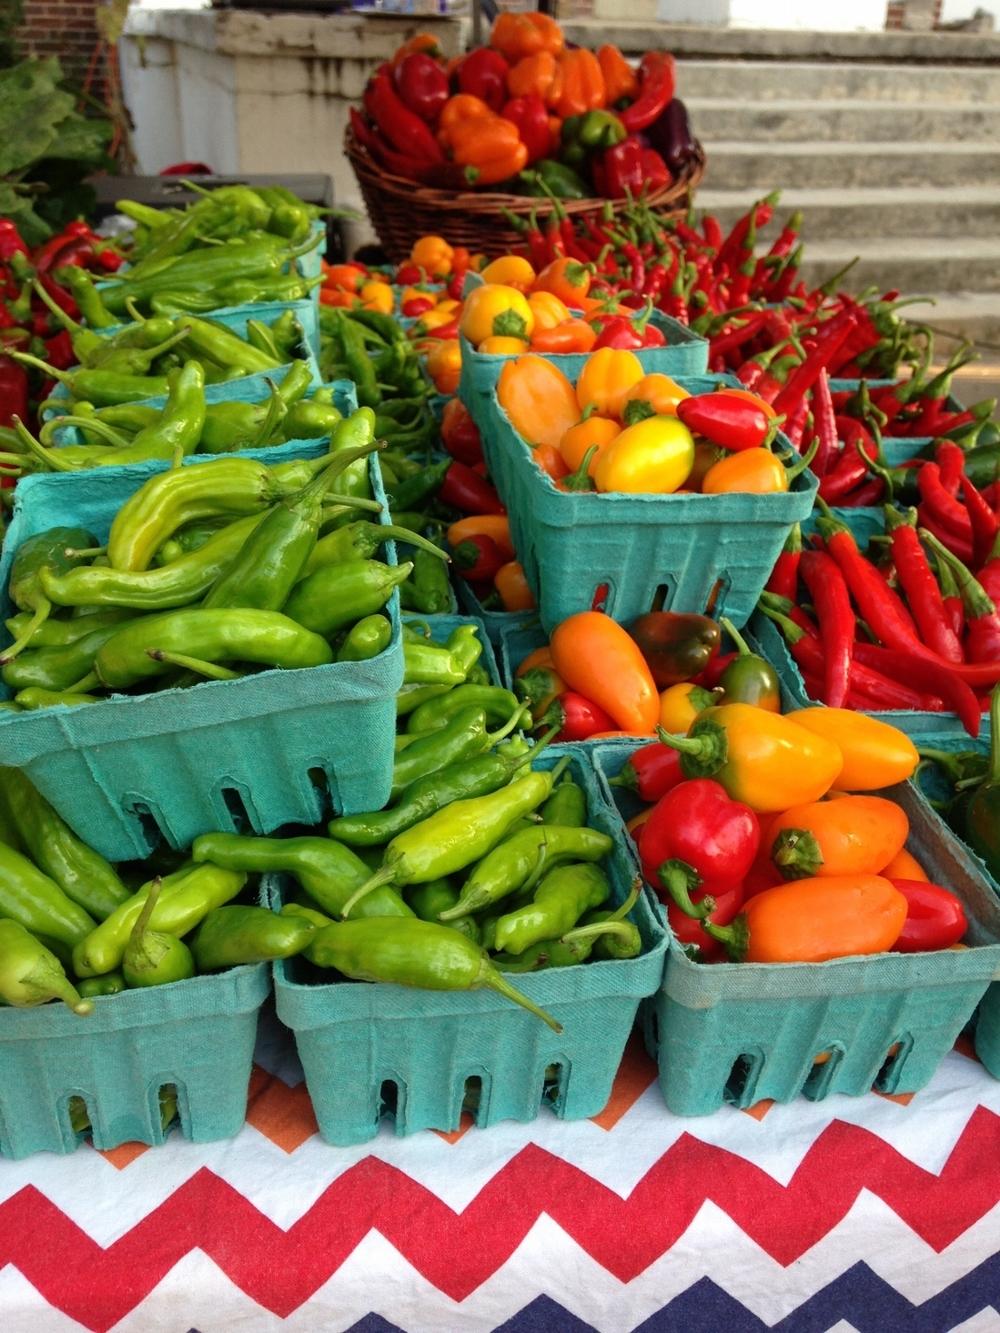 market_peppers (1125x1500).jpg